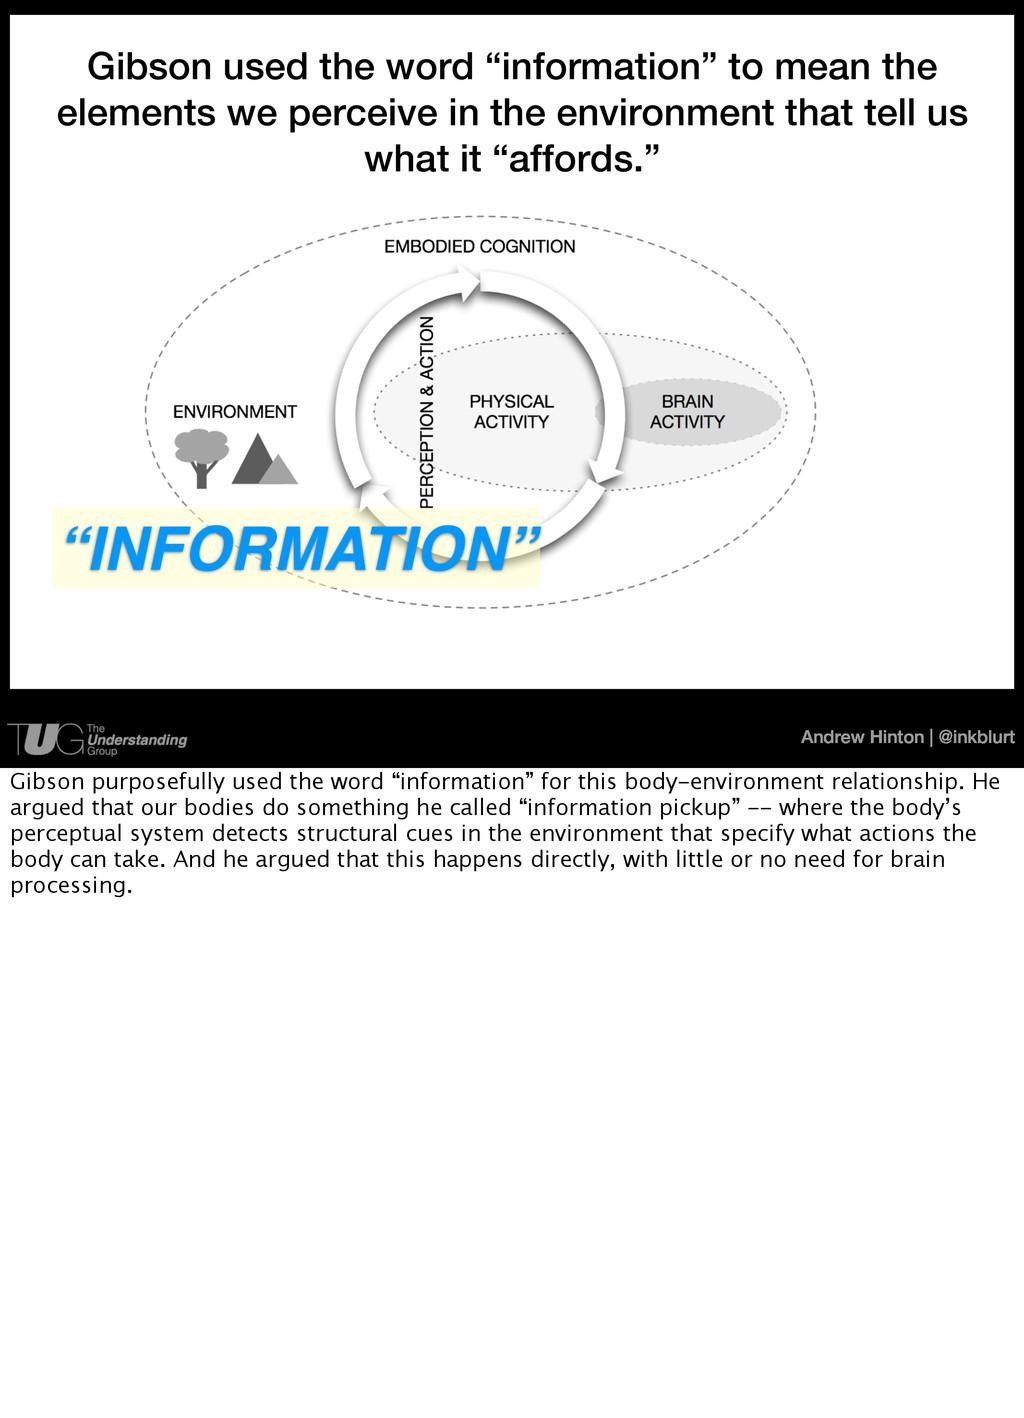 Andrew Hinton   @inkblurt Ecological Informatio...